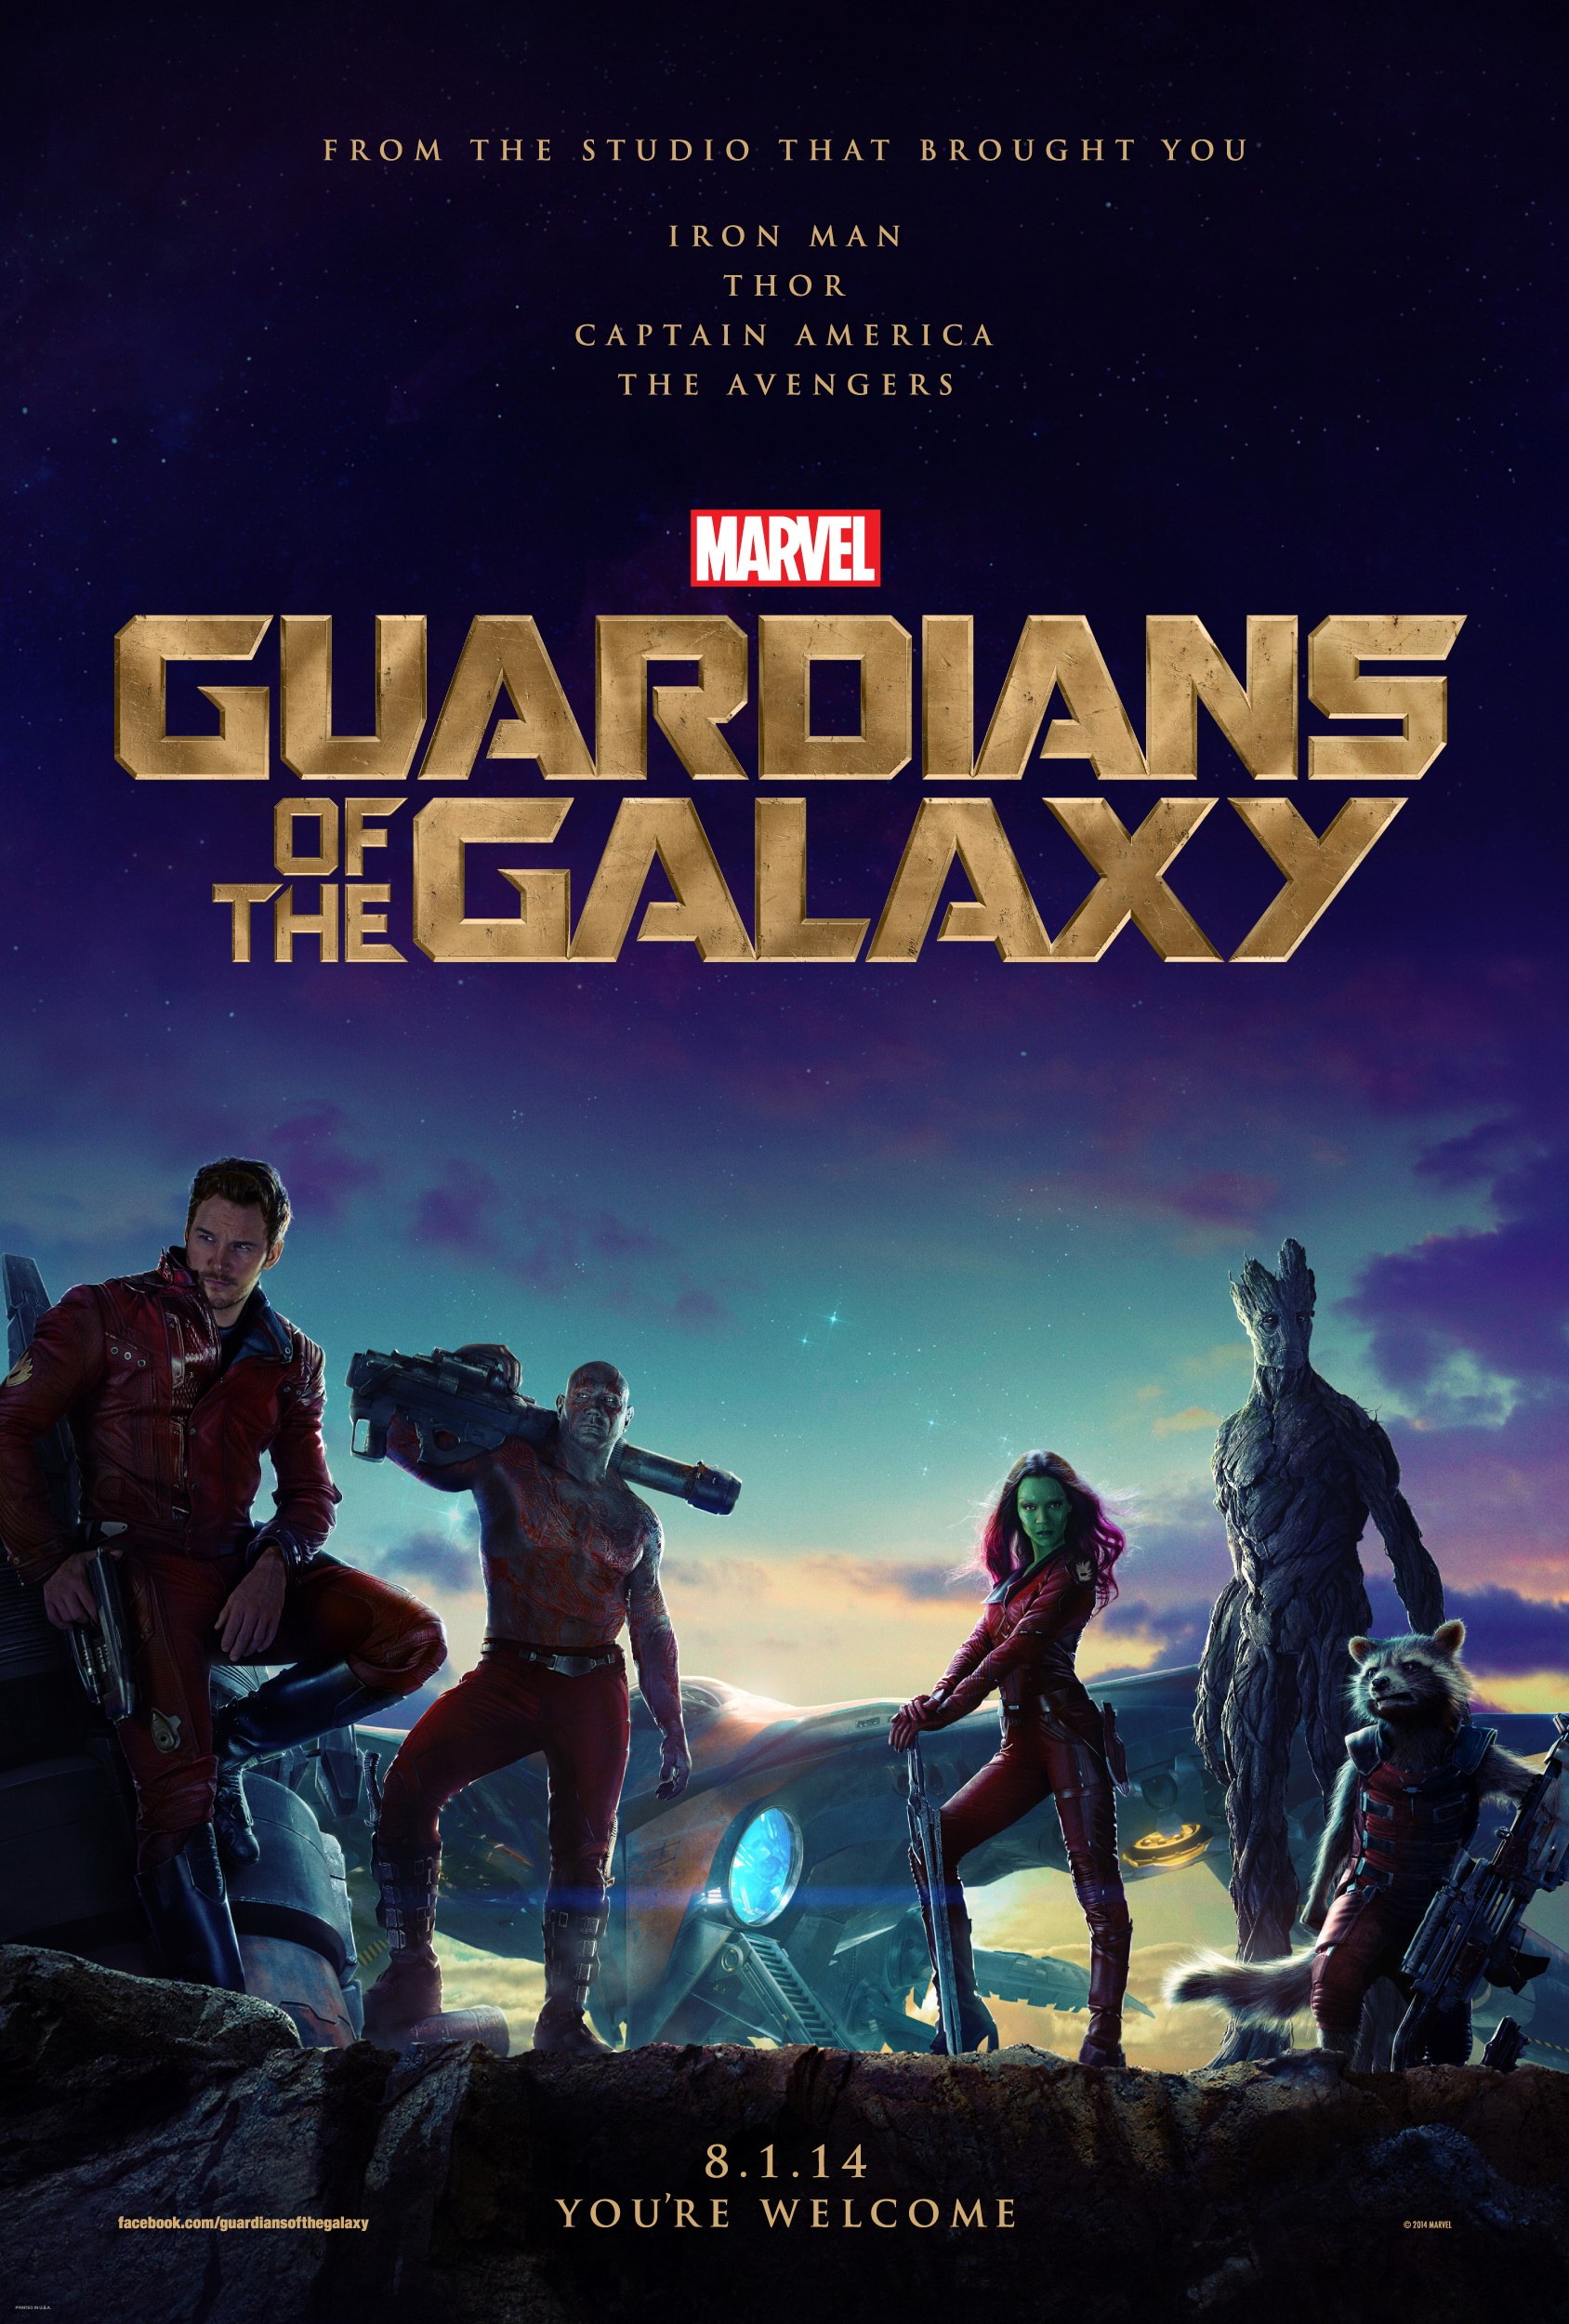 Gamora/Gallery